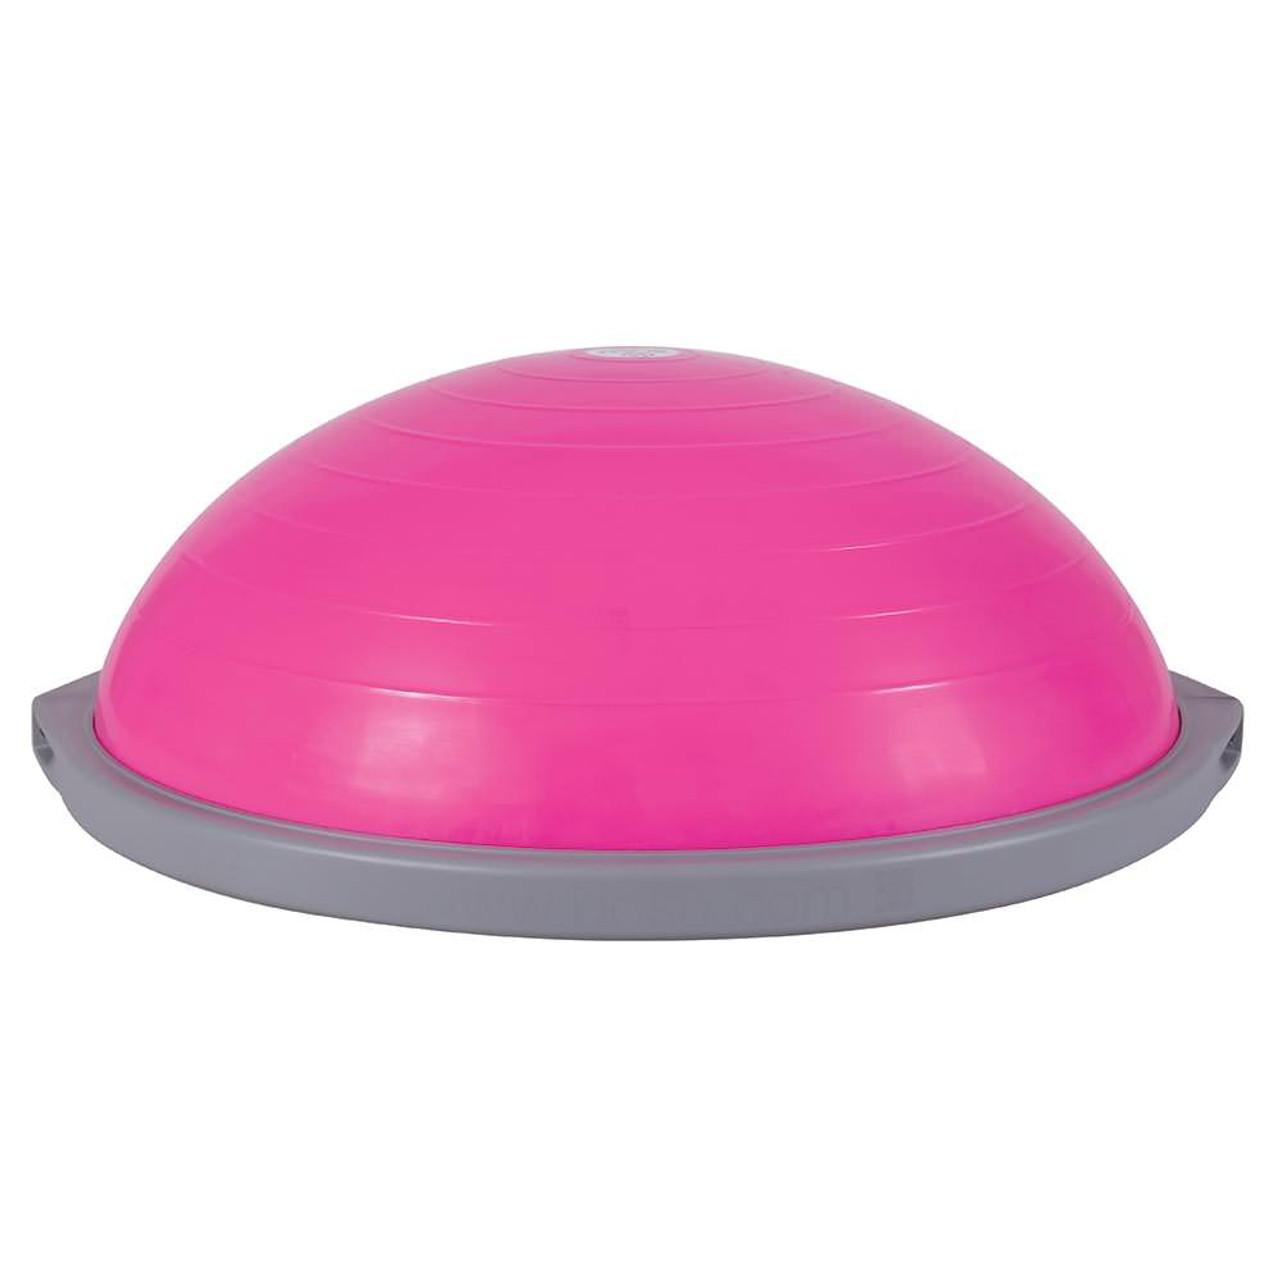 BOSU® Pink Pro Balance Trainer - Square